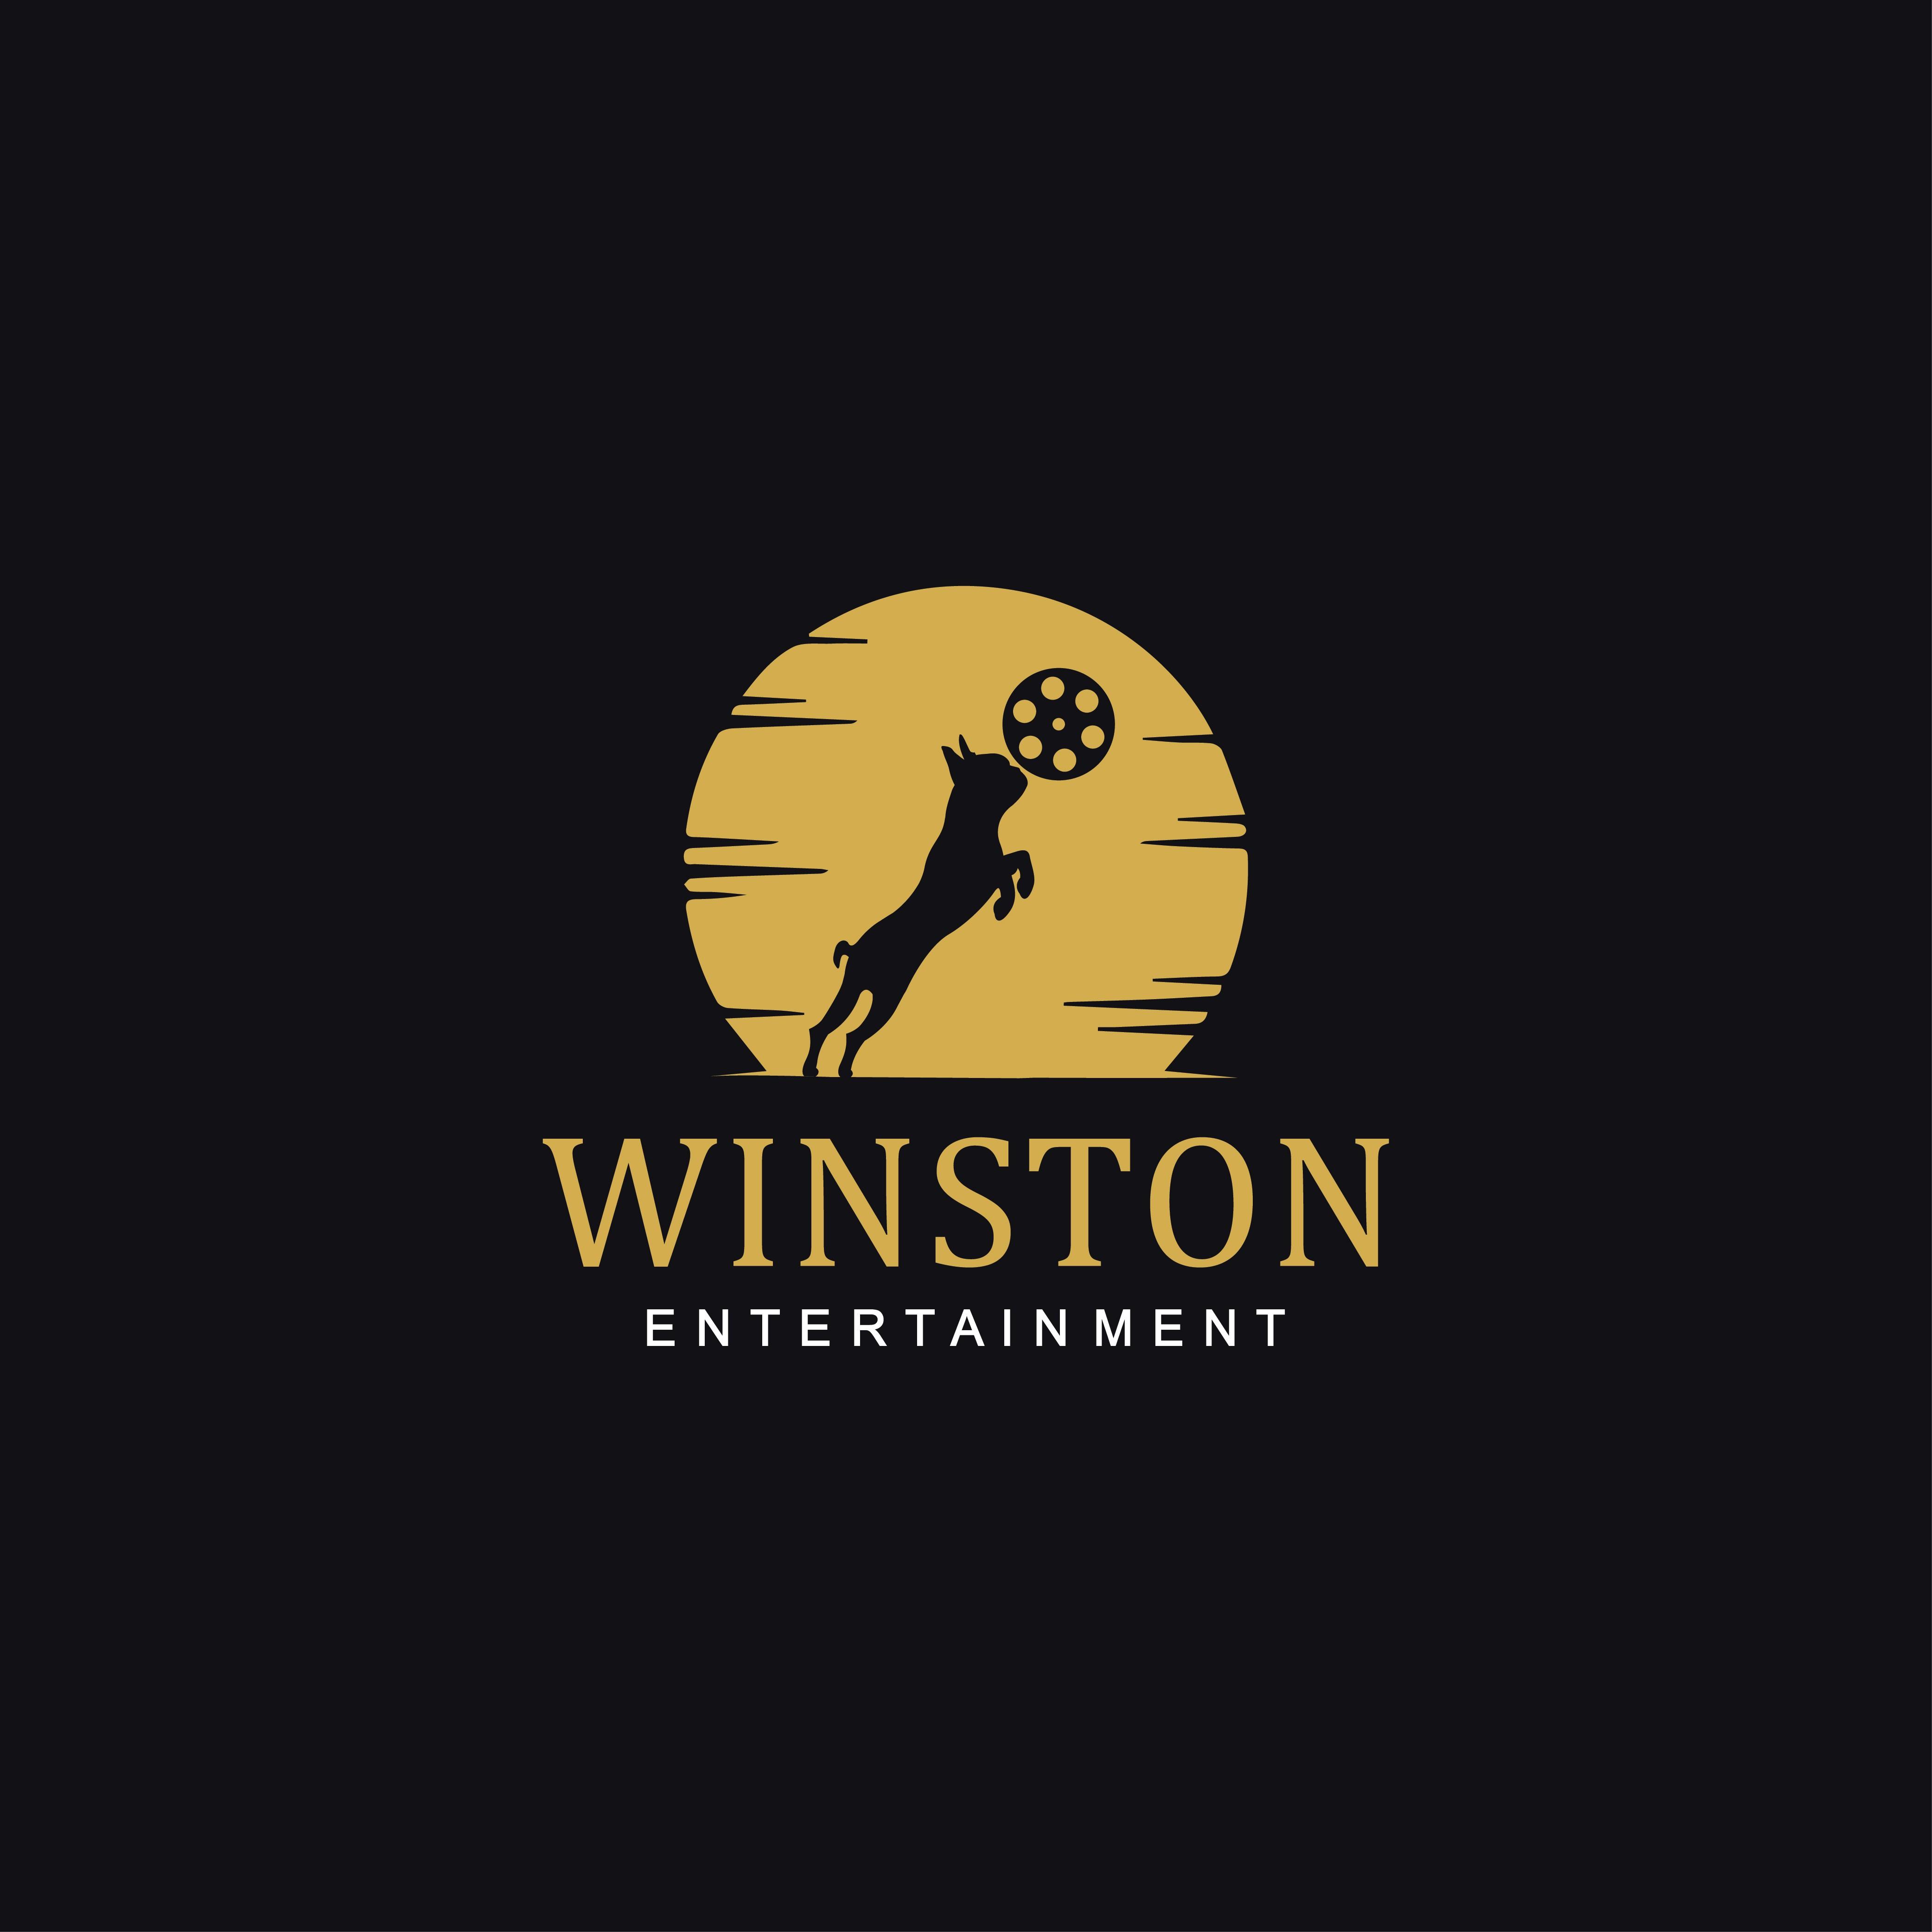 Adventure travel TV/Film Production Company needs a logo